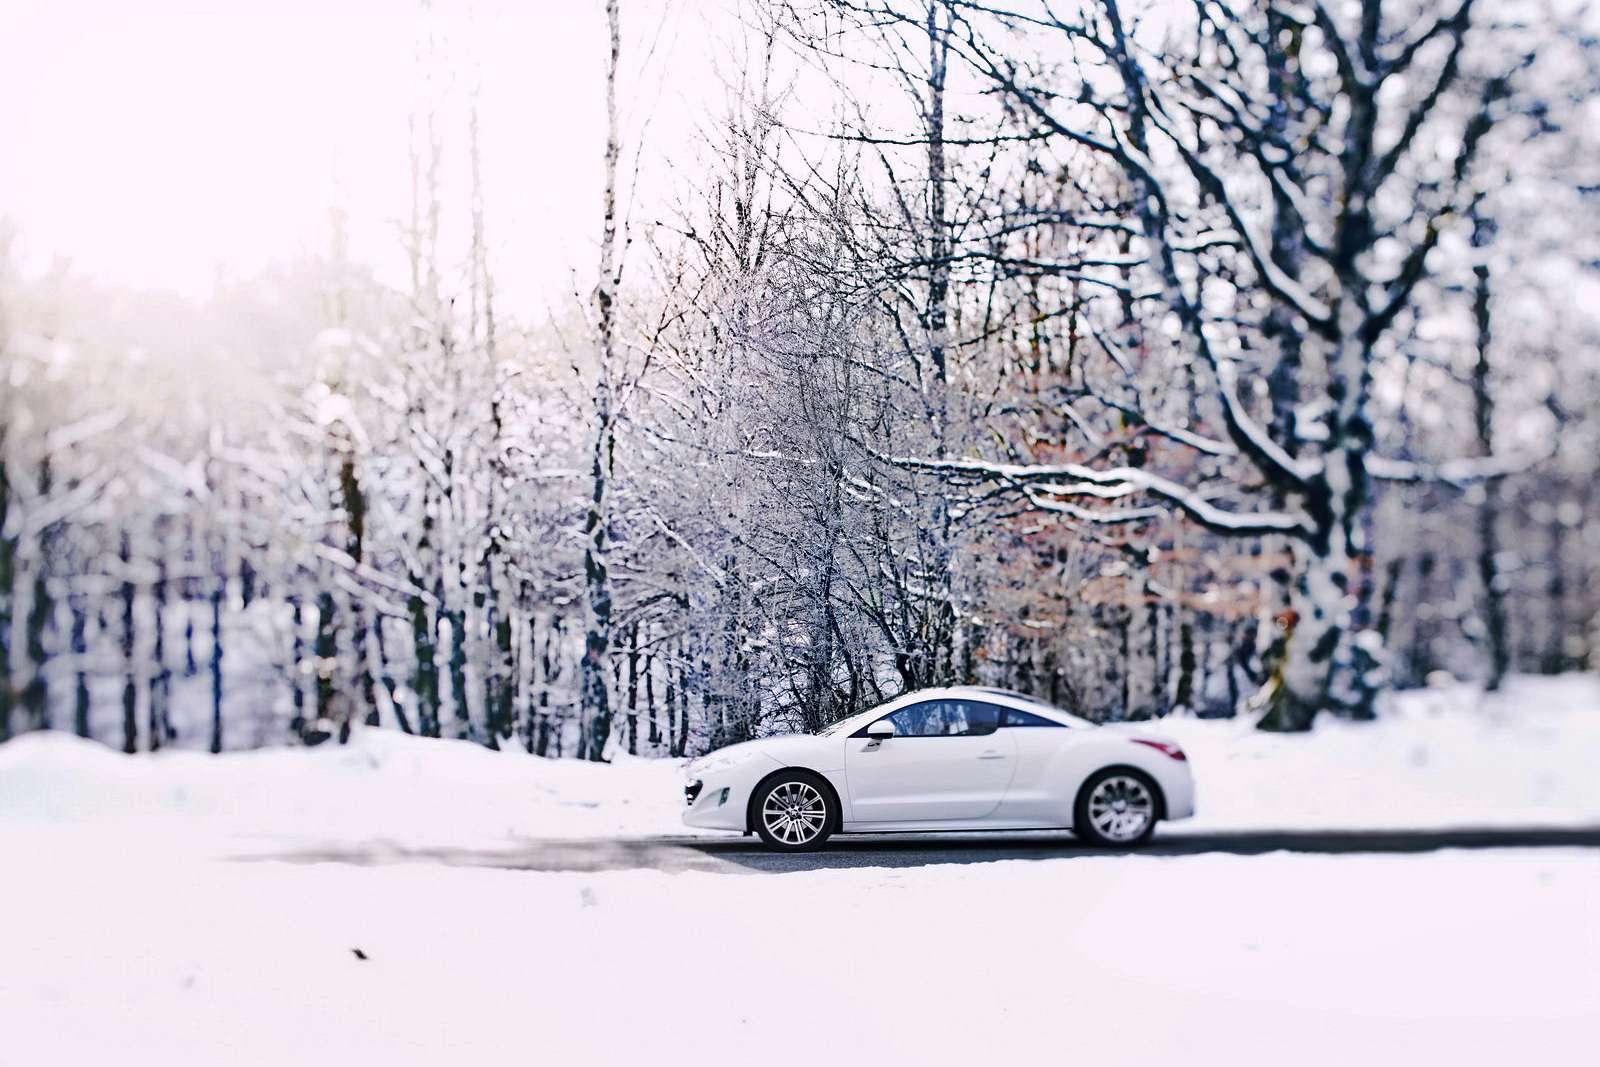 Peugeot RCZ mega gallery 2010